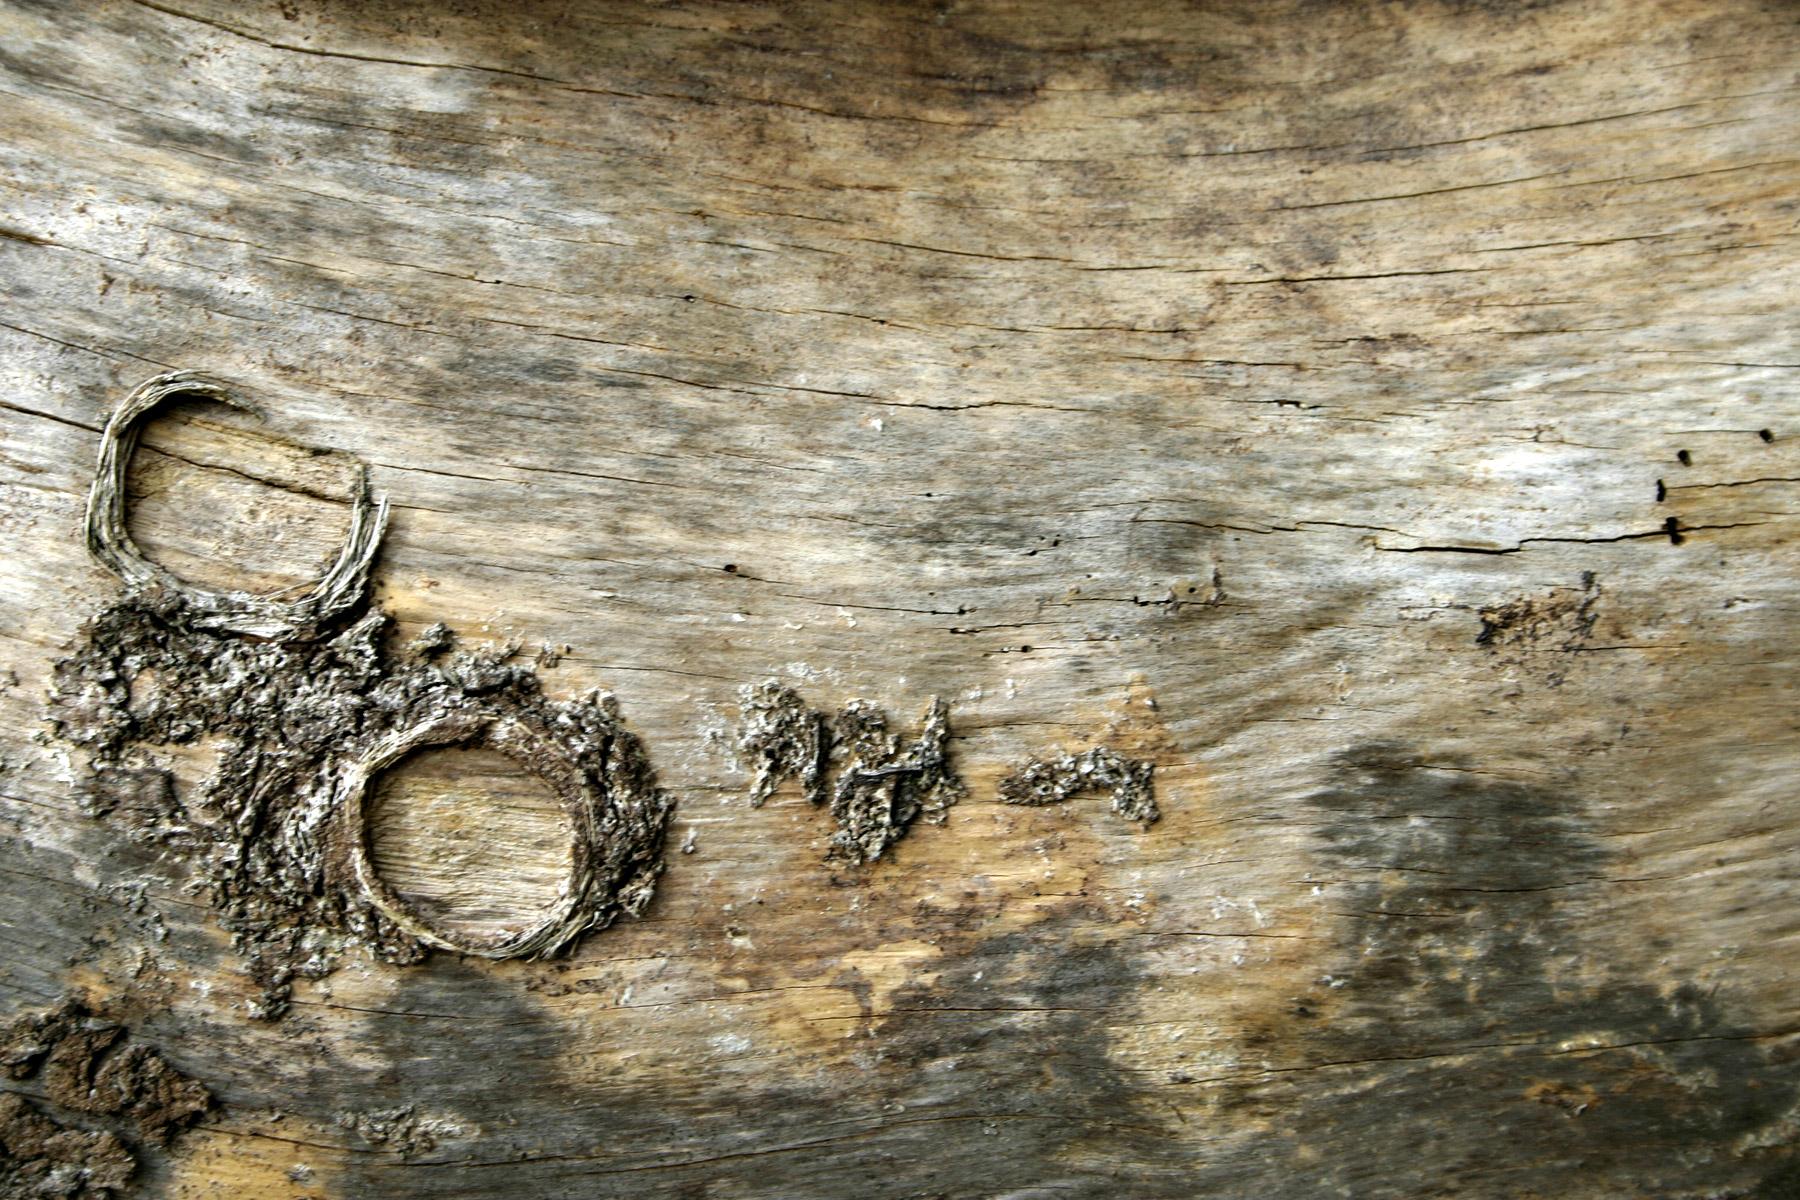 Wood texture, Bark, Cracked, Nature, Texture, HQ Photo